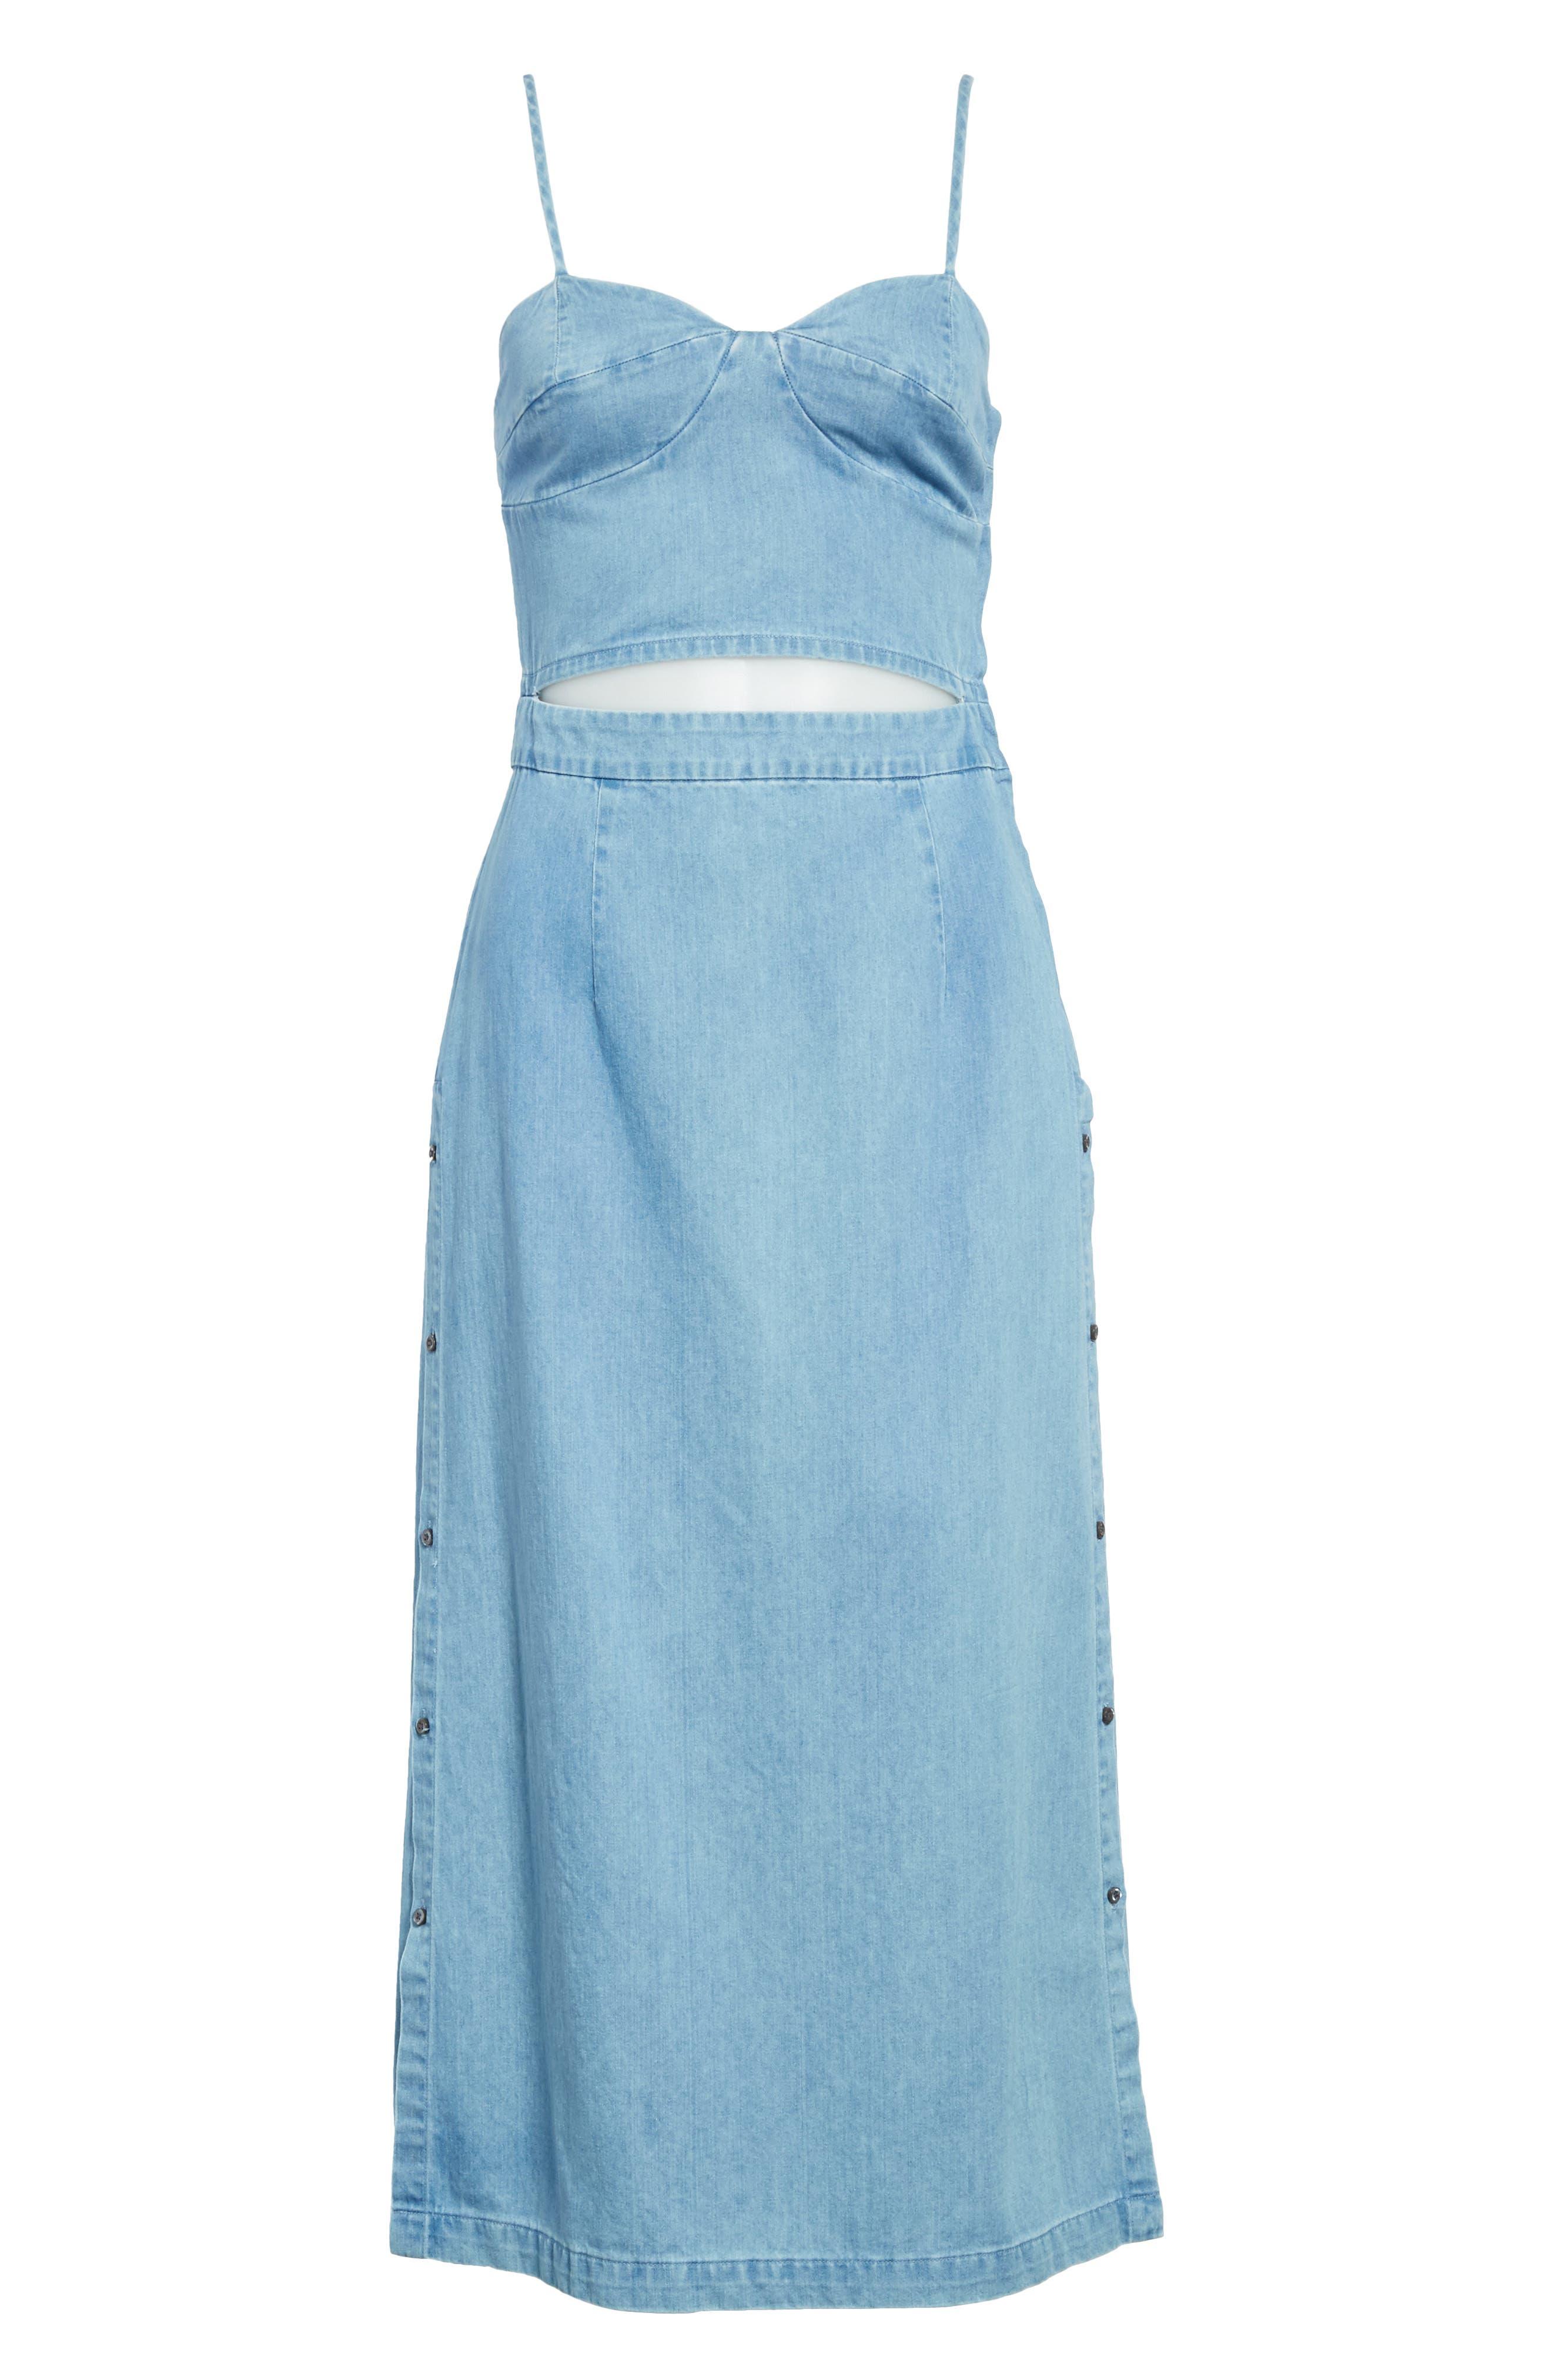 Peekaboo Chambray Midi Dress,                             Alternate thumbnail 6, color,                             421